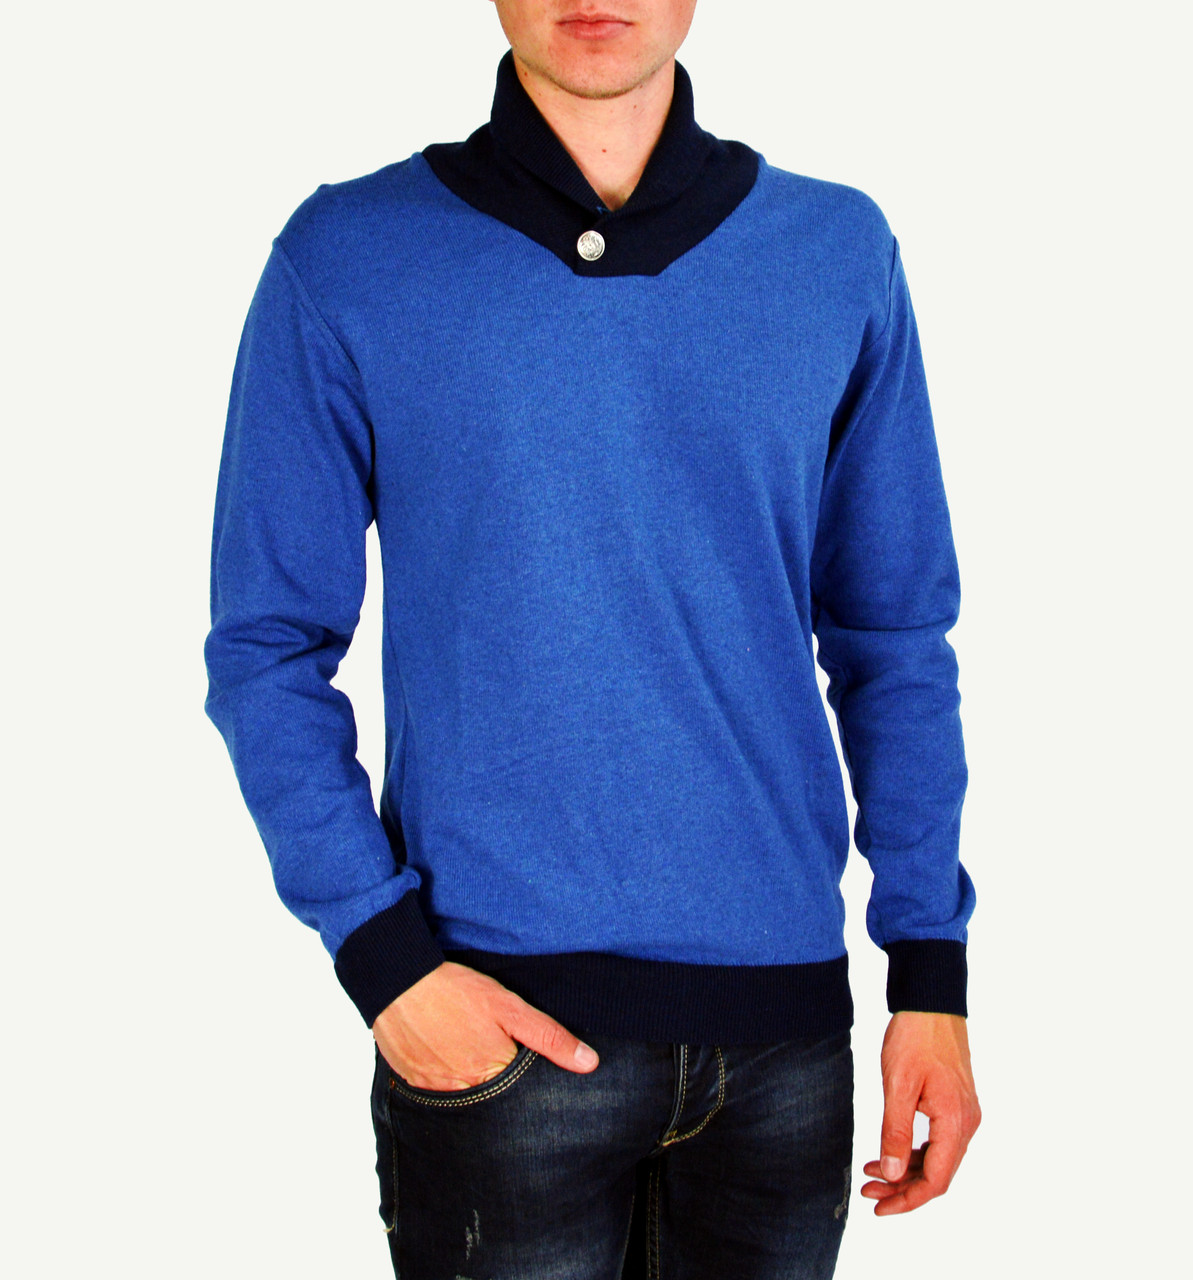 Синий мужской теплый свитер GLANCARLO с горлом